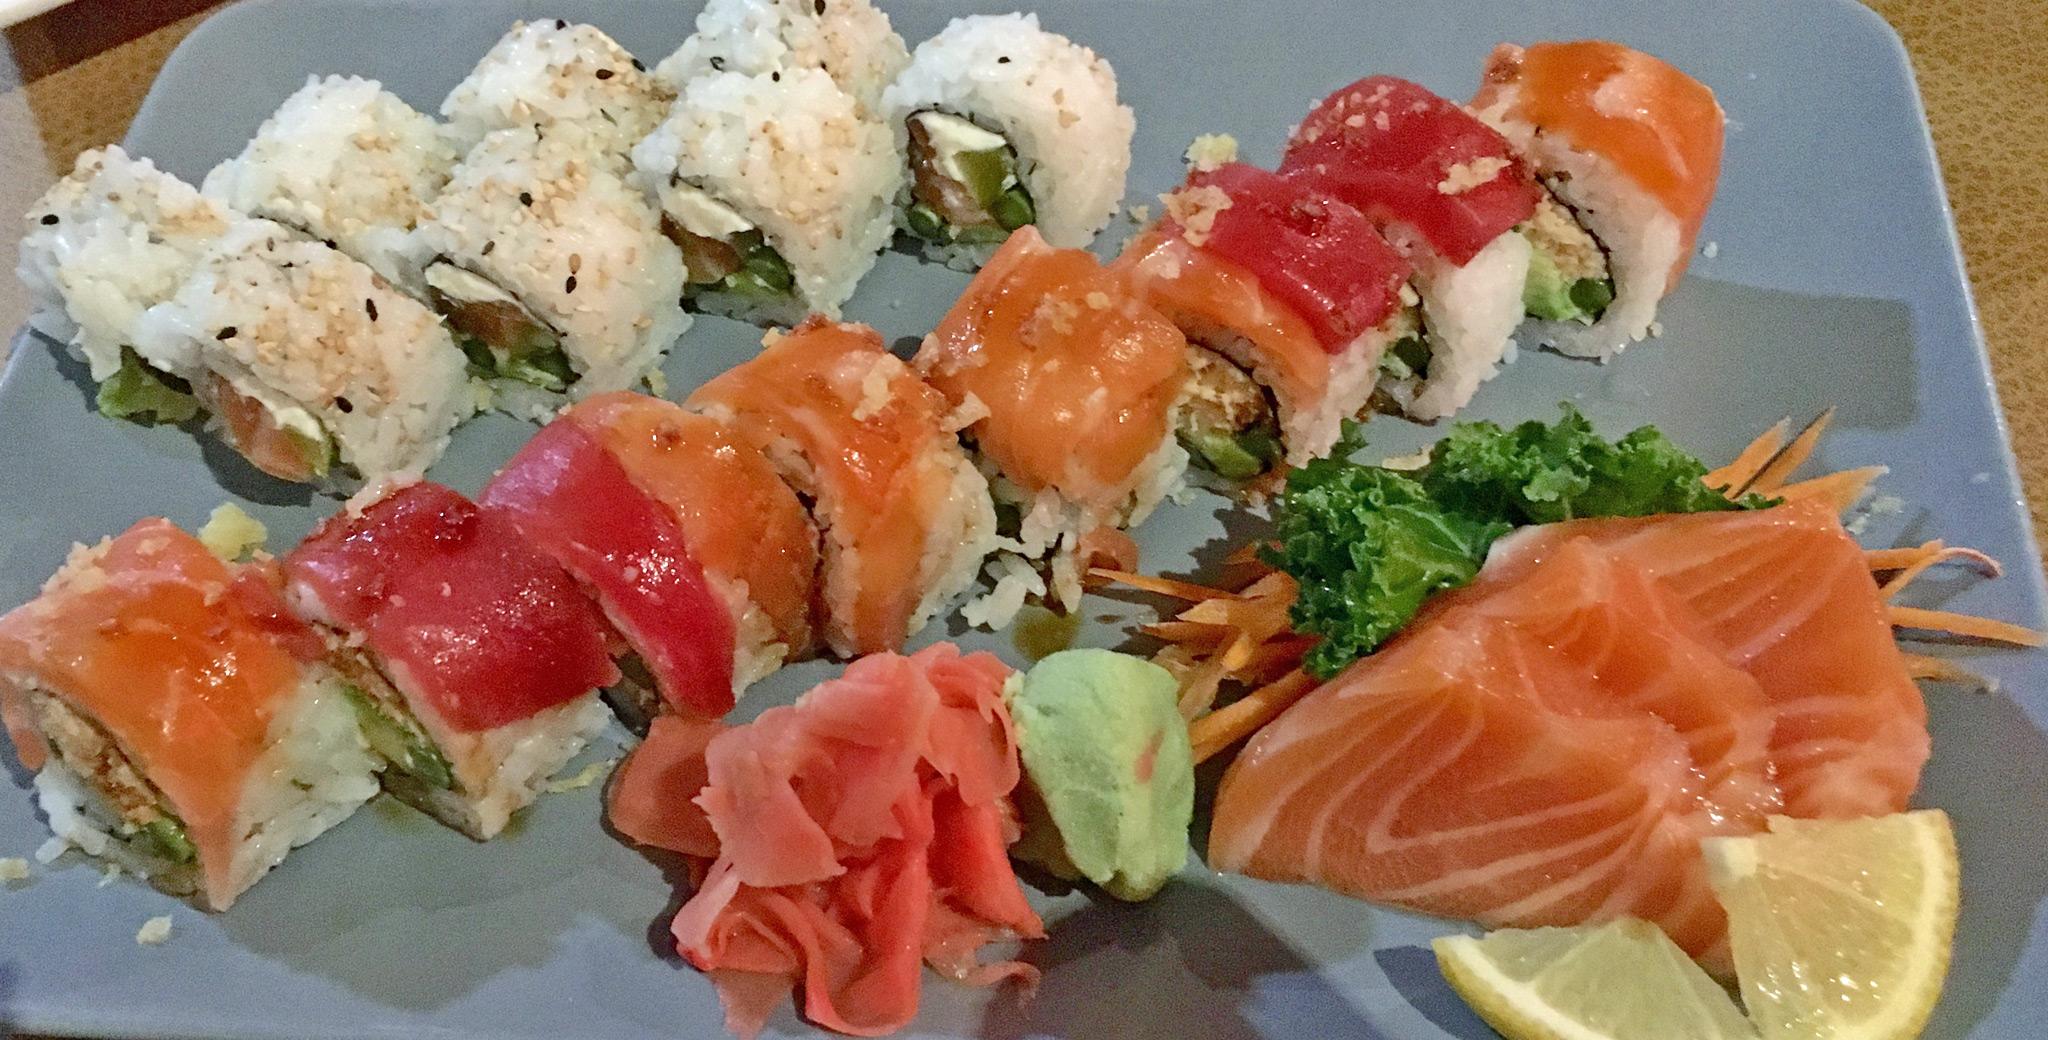 Top: THE DTSP - Salmon, pickle, cream cheese, avocado and asparagus. Middle: BOMB 'CHEL - Snow crab, avocado and asparagus roll topped with salmon, tuna, eel sauce, wasabi mayo and tempura chips. Bottom: Salmon Sashimi